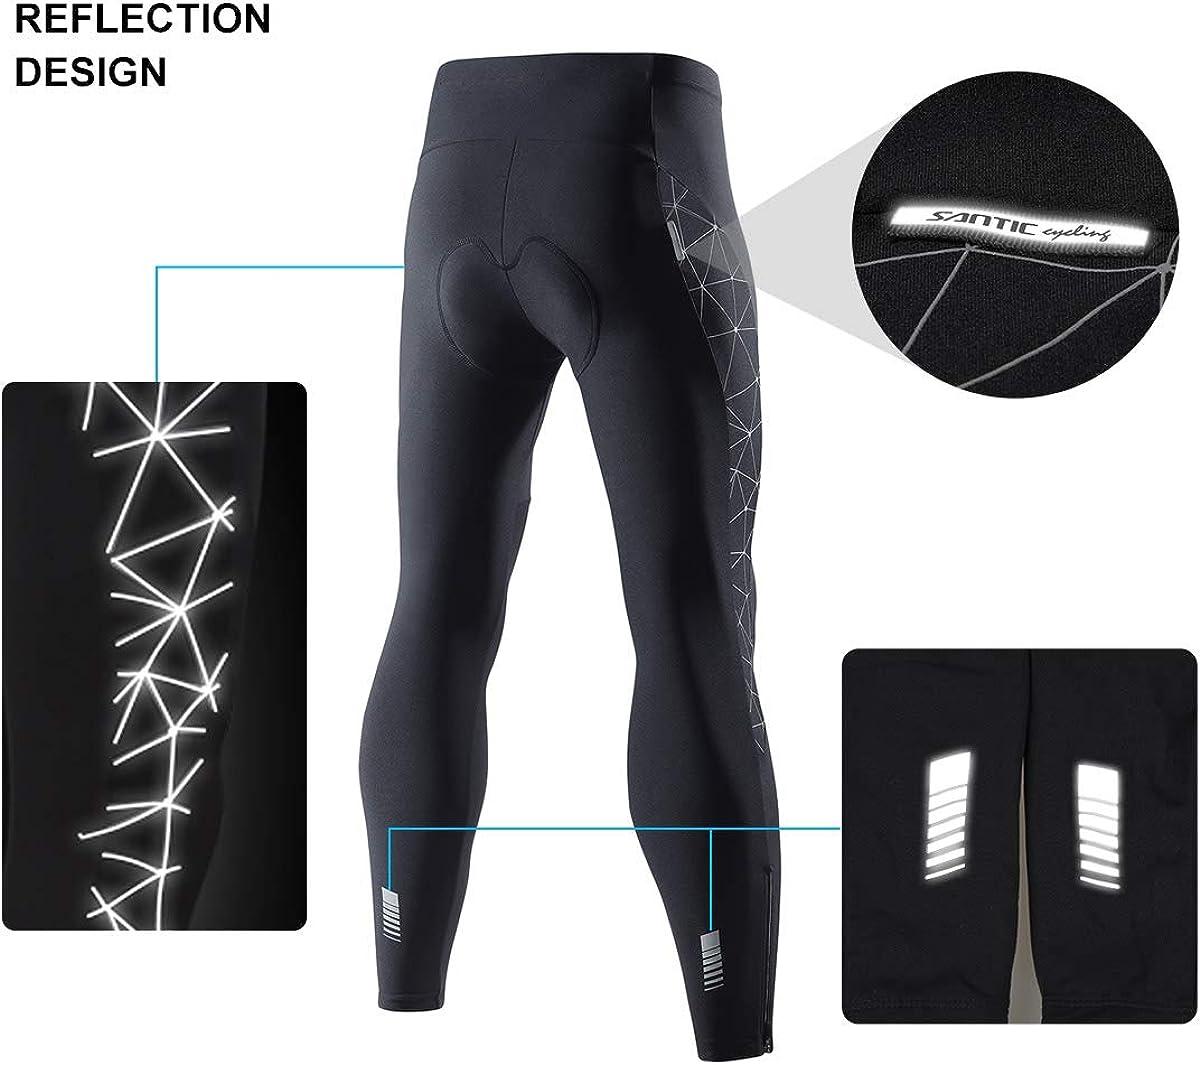 Santic Cycling Tights Fleece Thermal Padded Bicycle Pants Reflective Winter Leggings